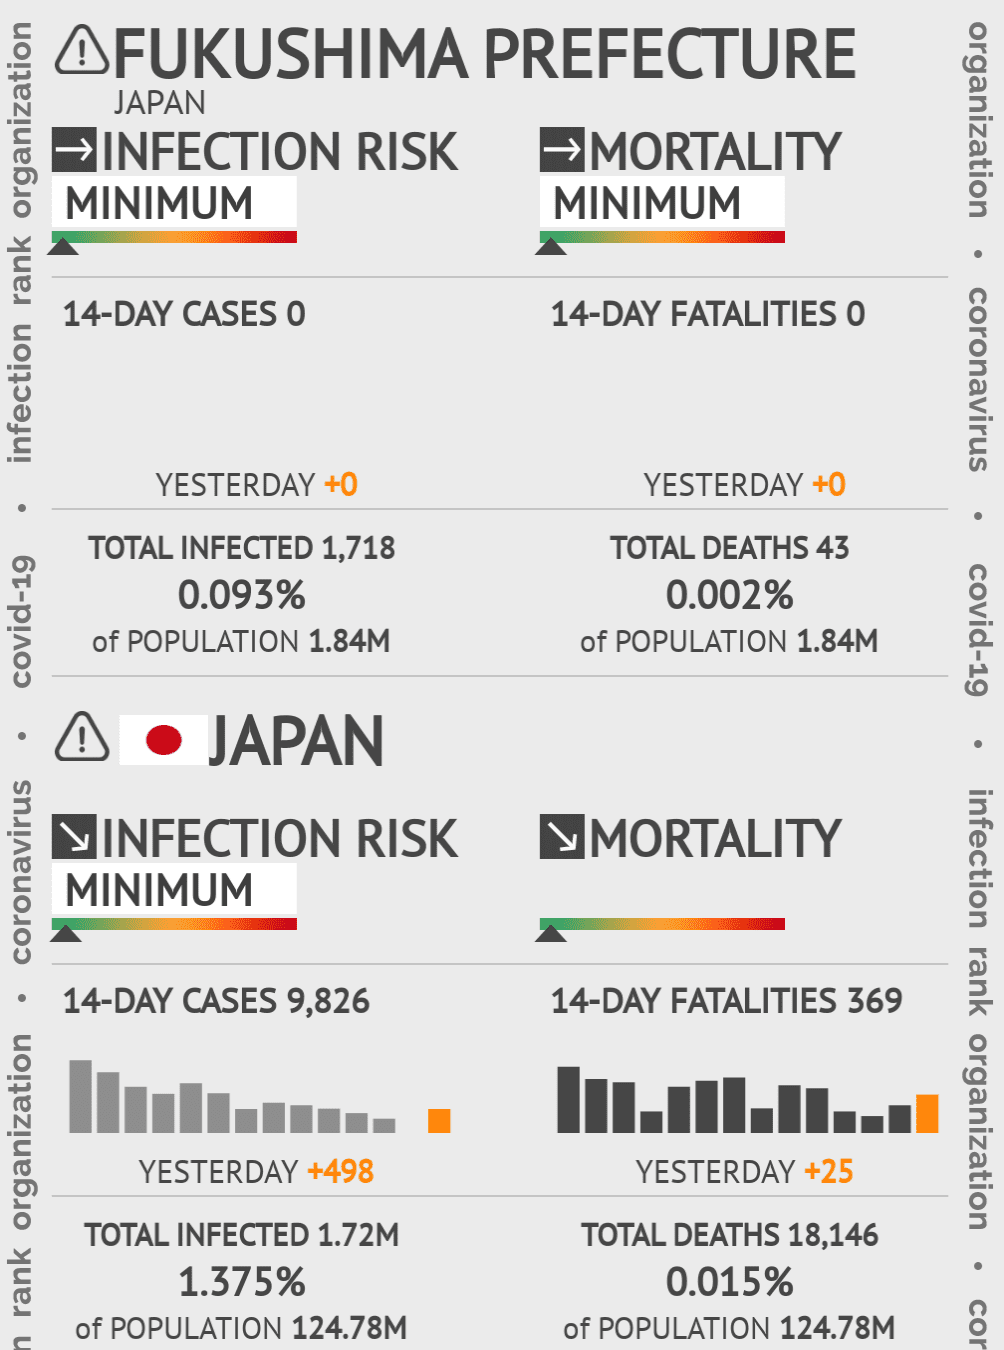 Fukushima Coronavirus Covid-19 Risk of Infection on March 02, 2021